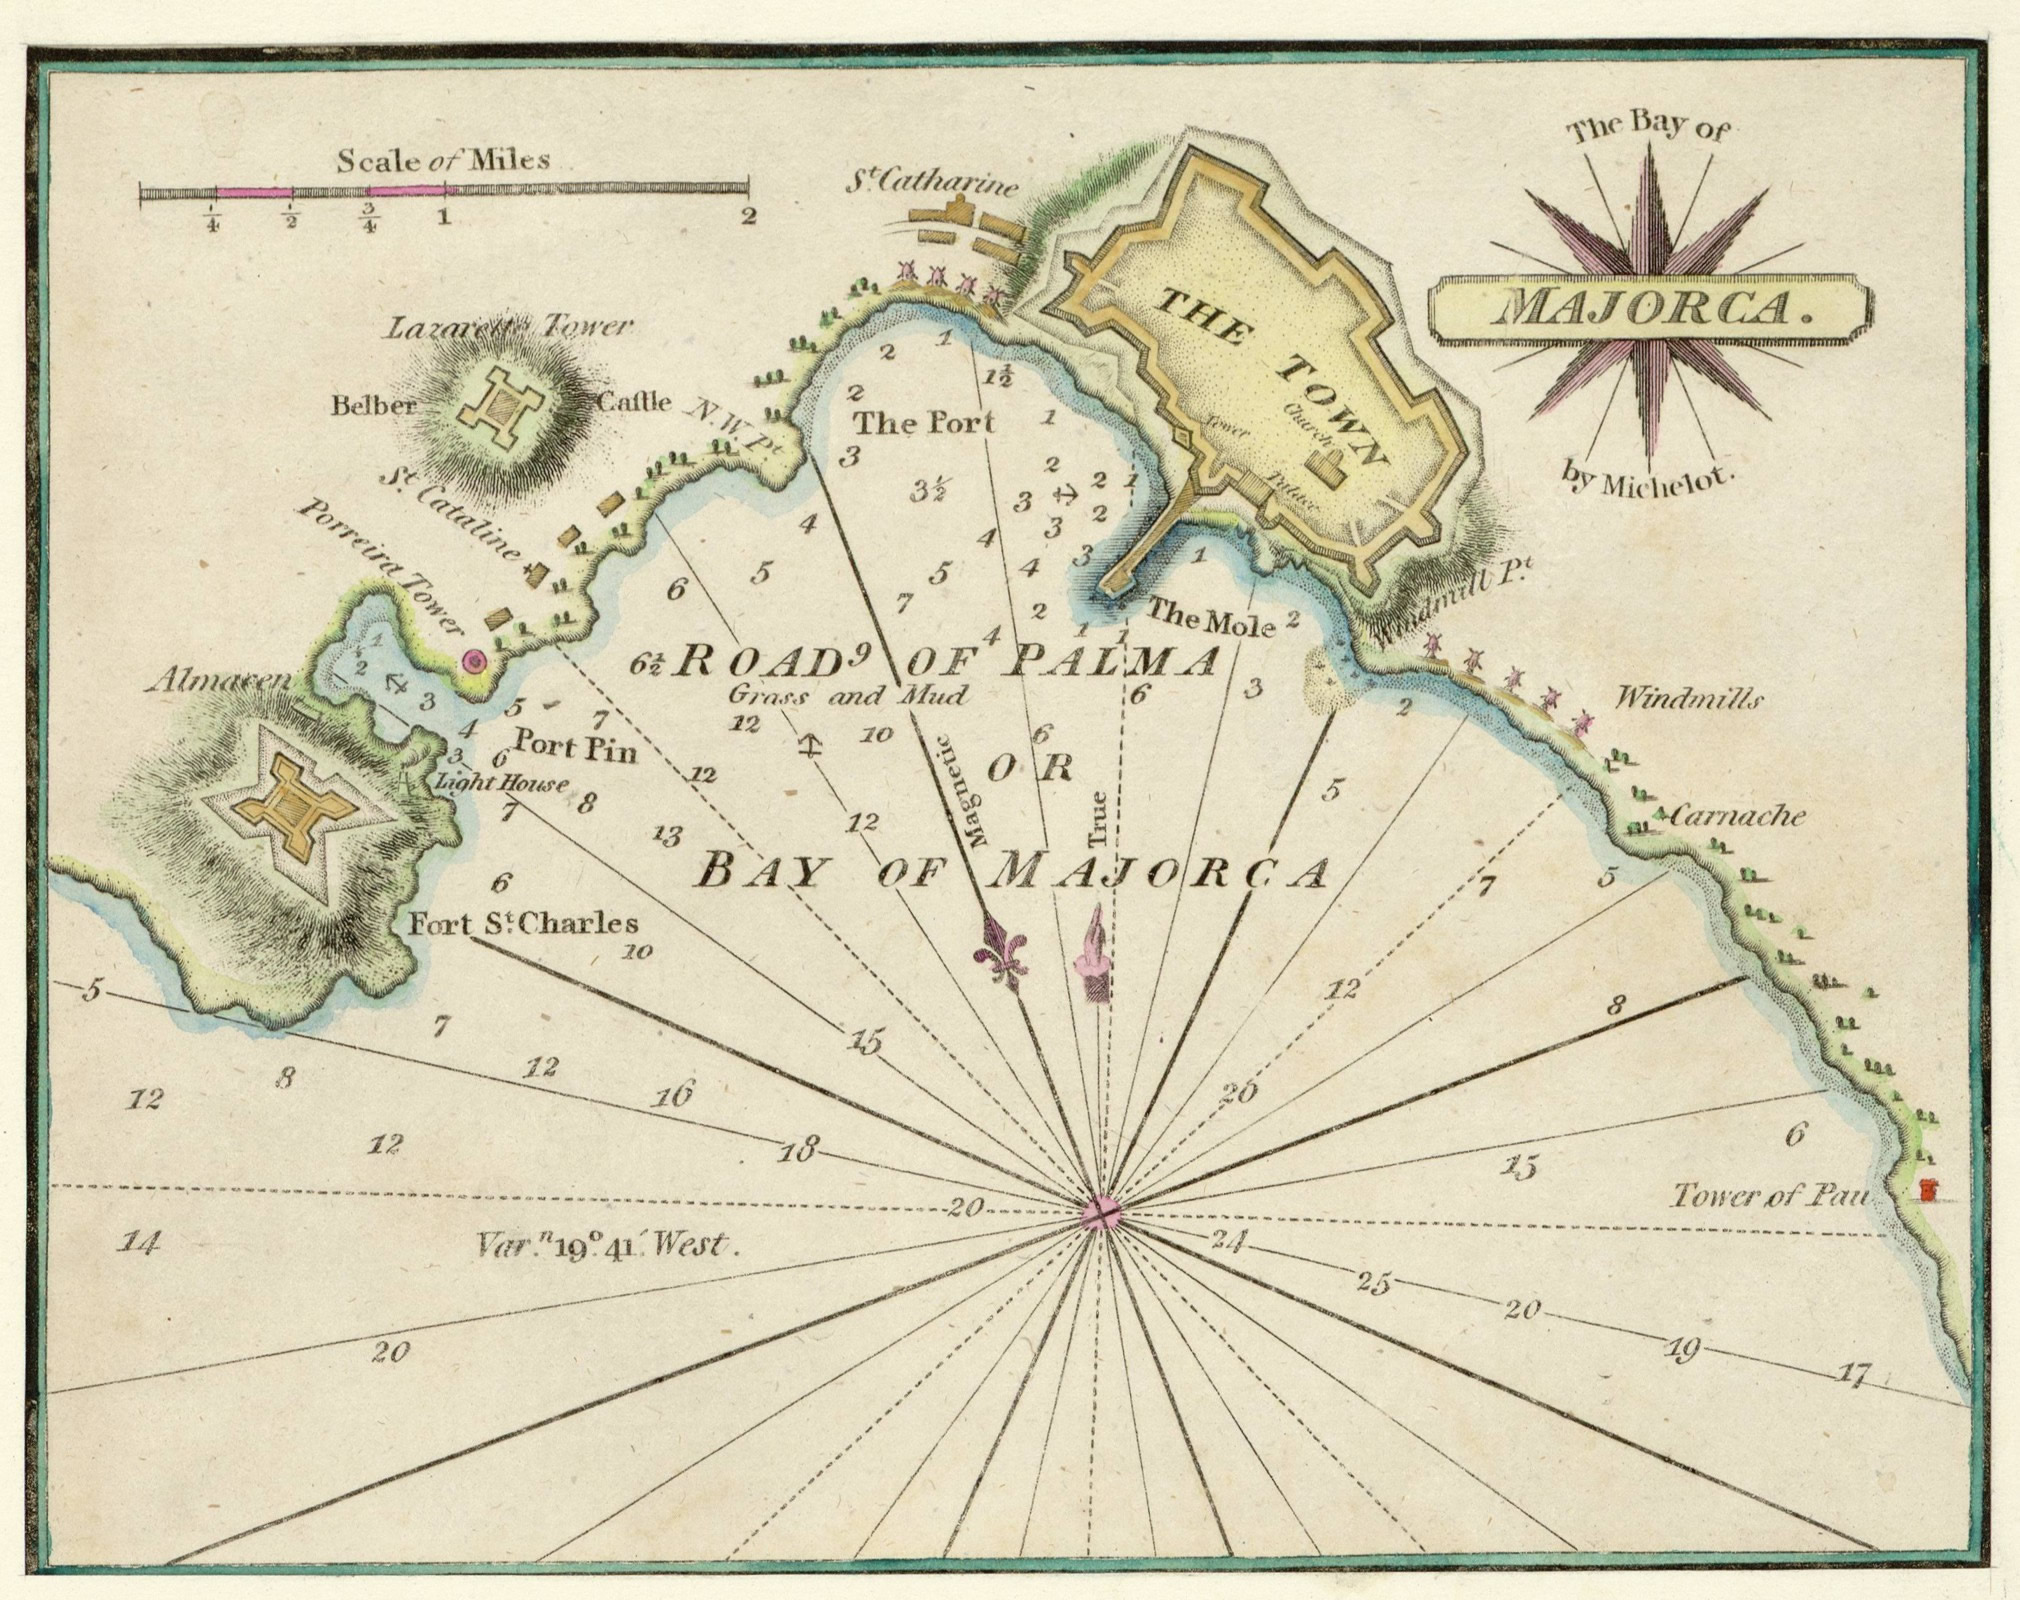 La bahía de Mallorca 1810